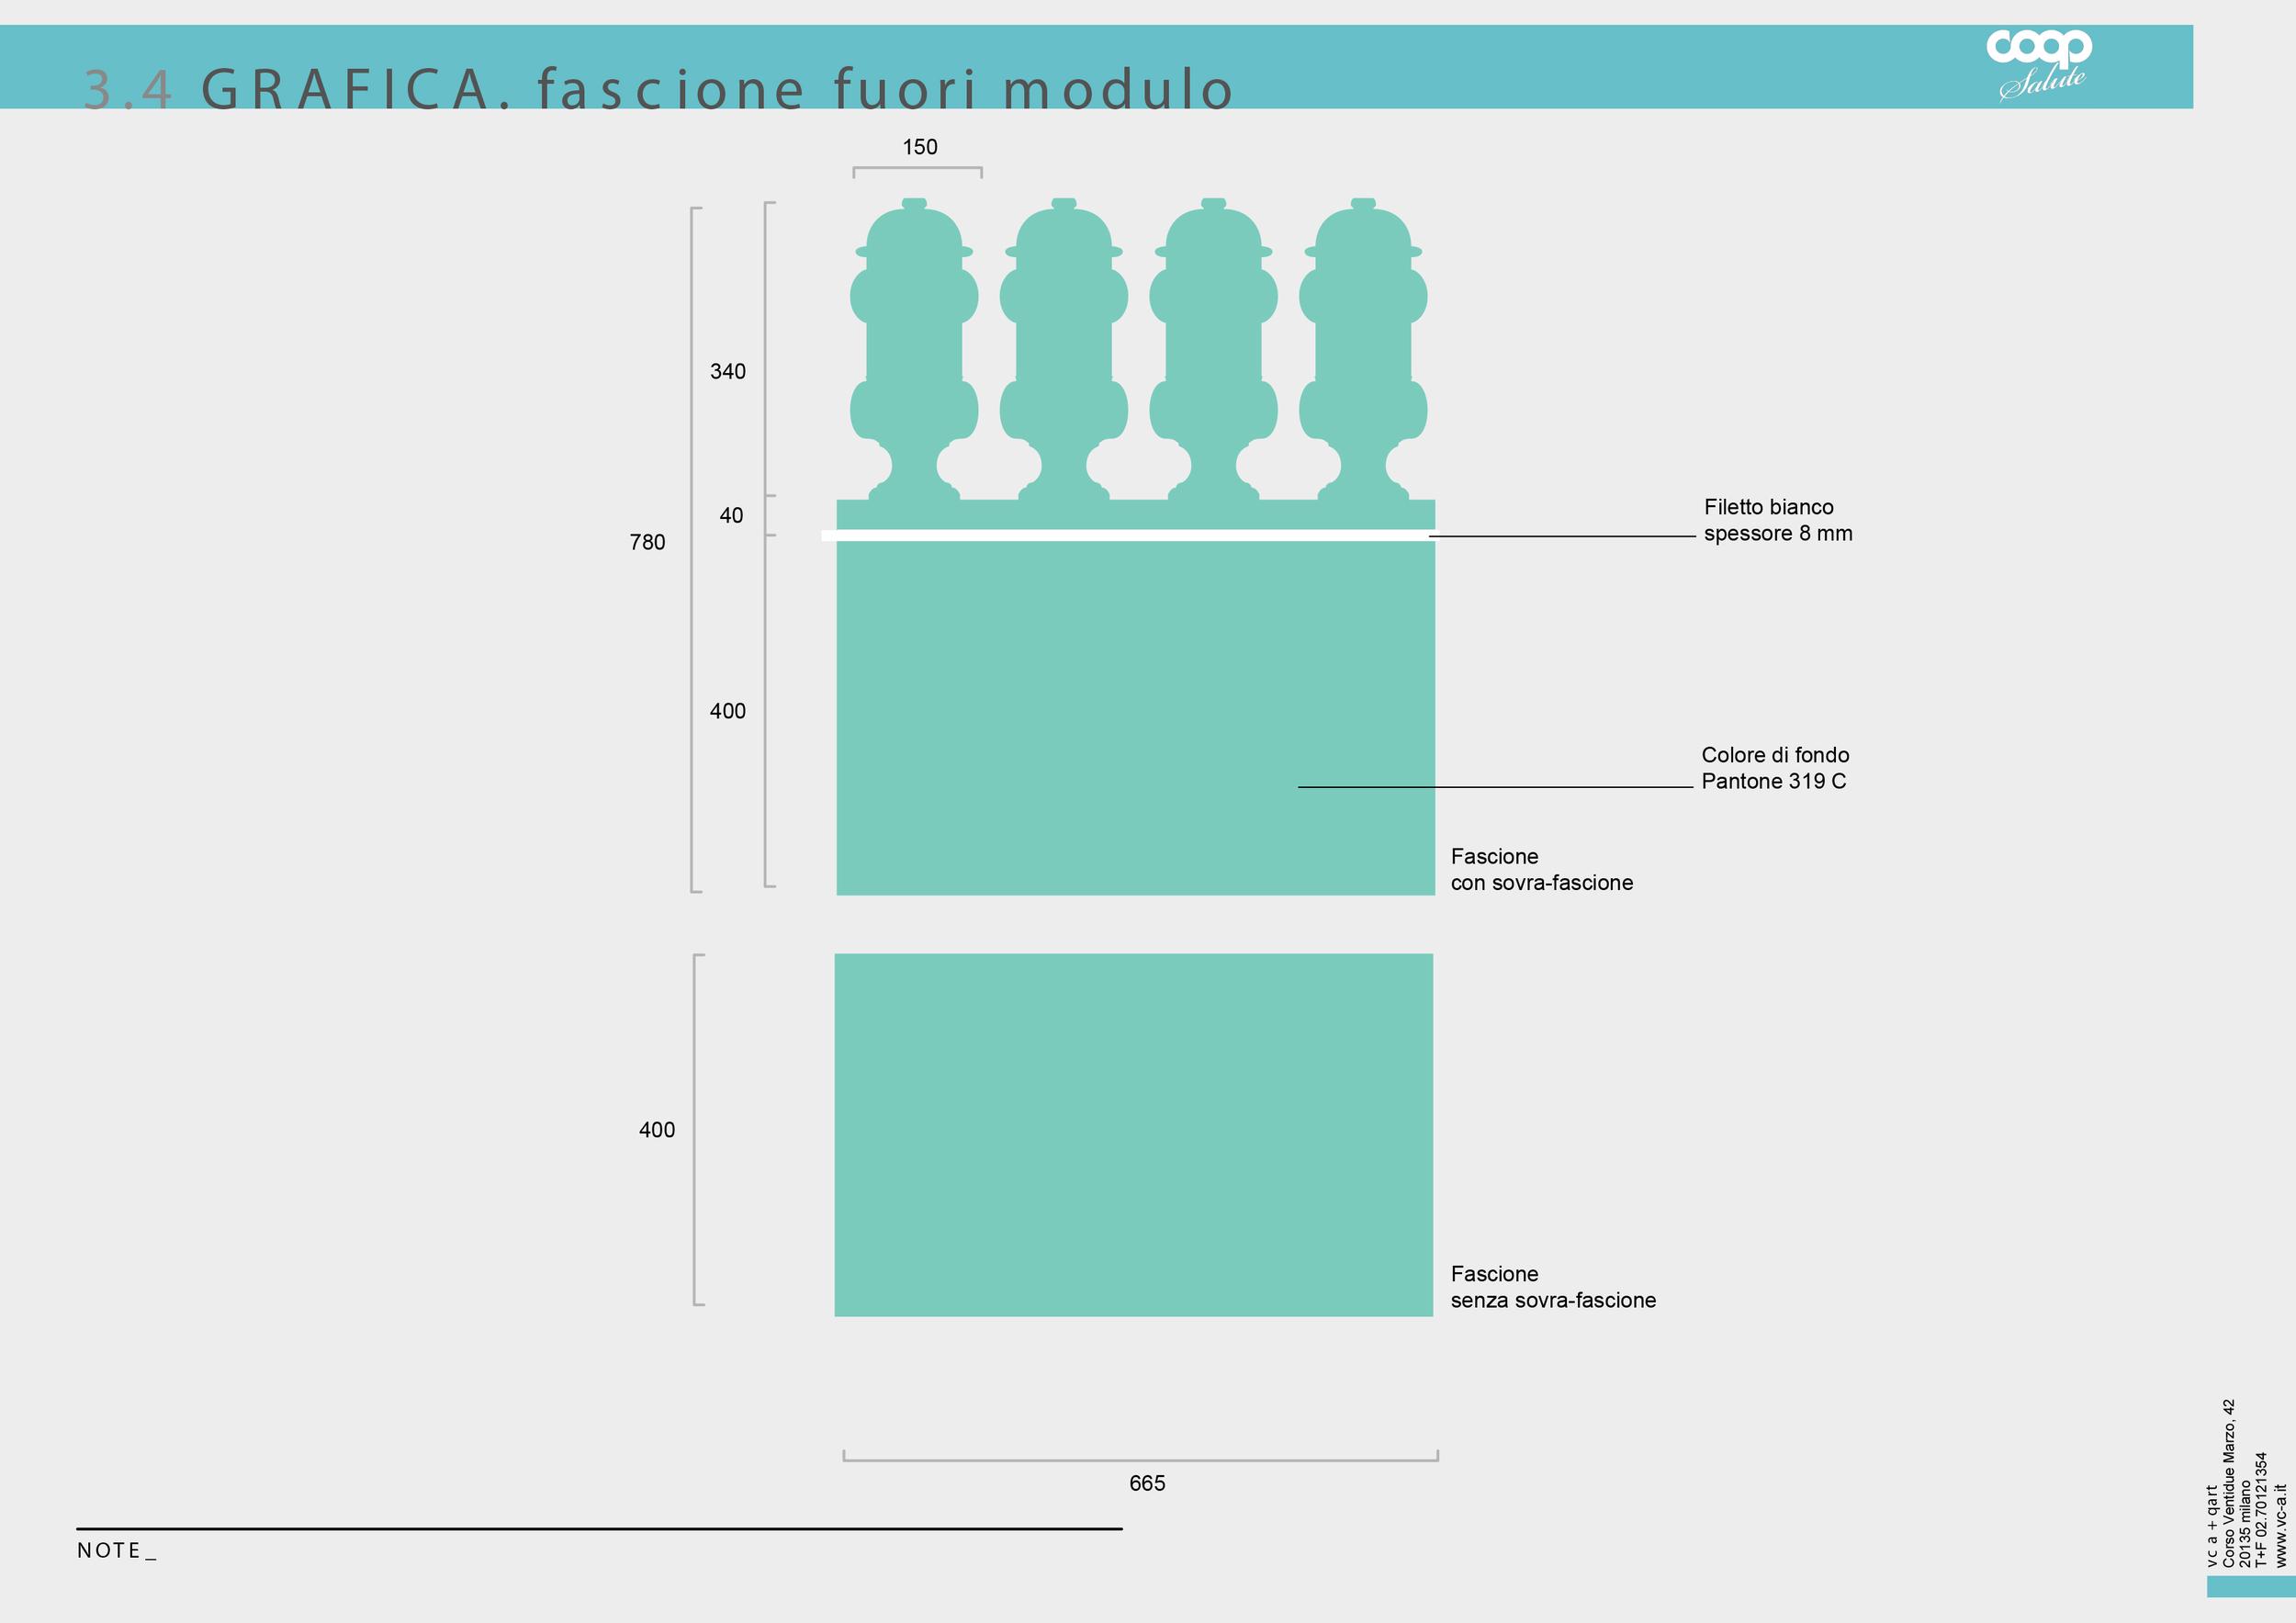 Farma-Coop-MANUALE-21.jpg